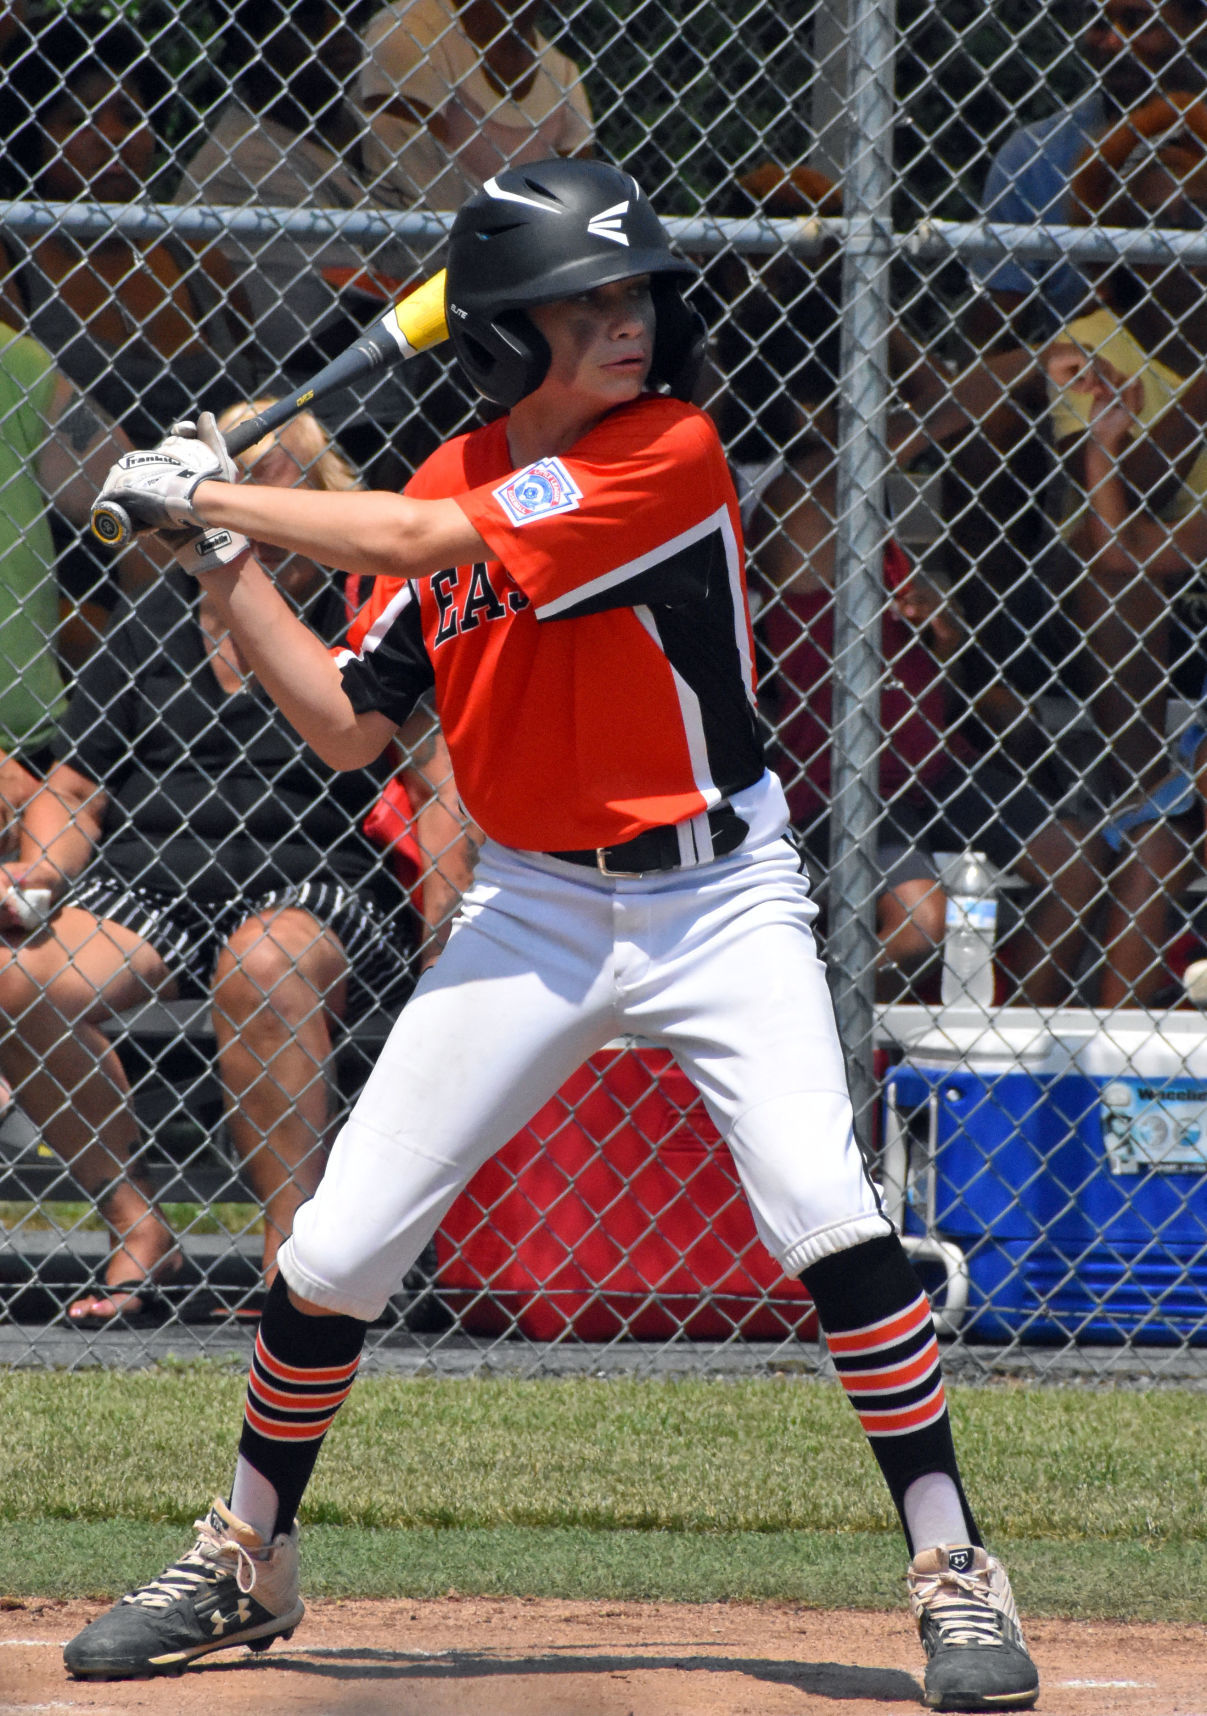 2019 Little League 11-12 Baseball State Playoffs: Easton vs. Hughesville, July 24, 2019